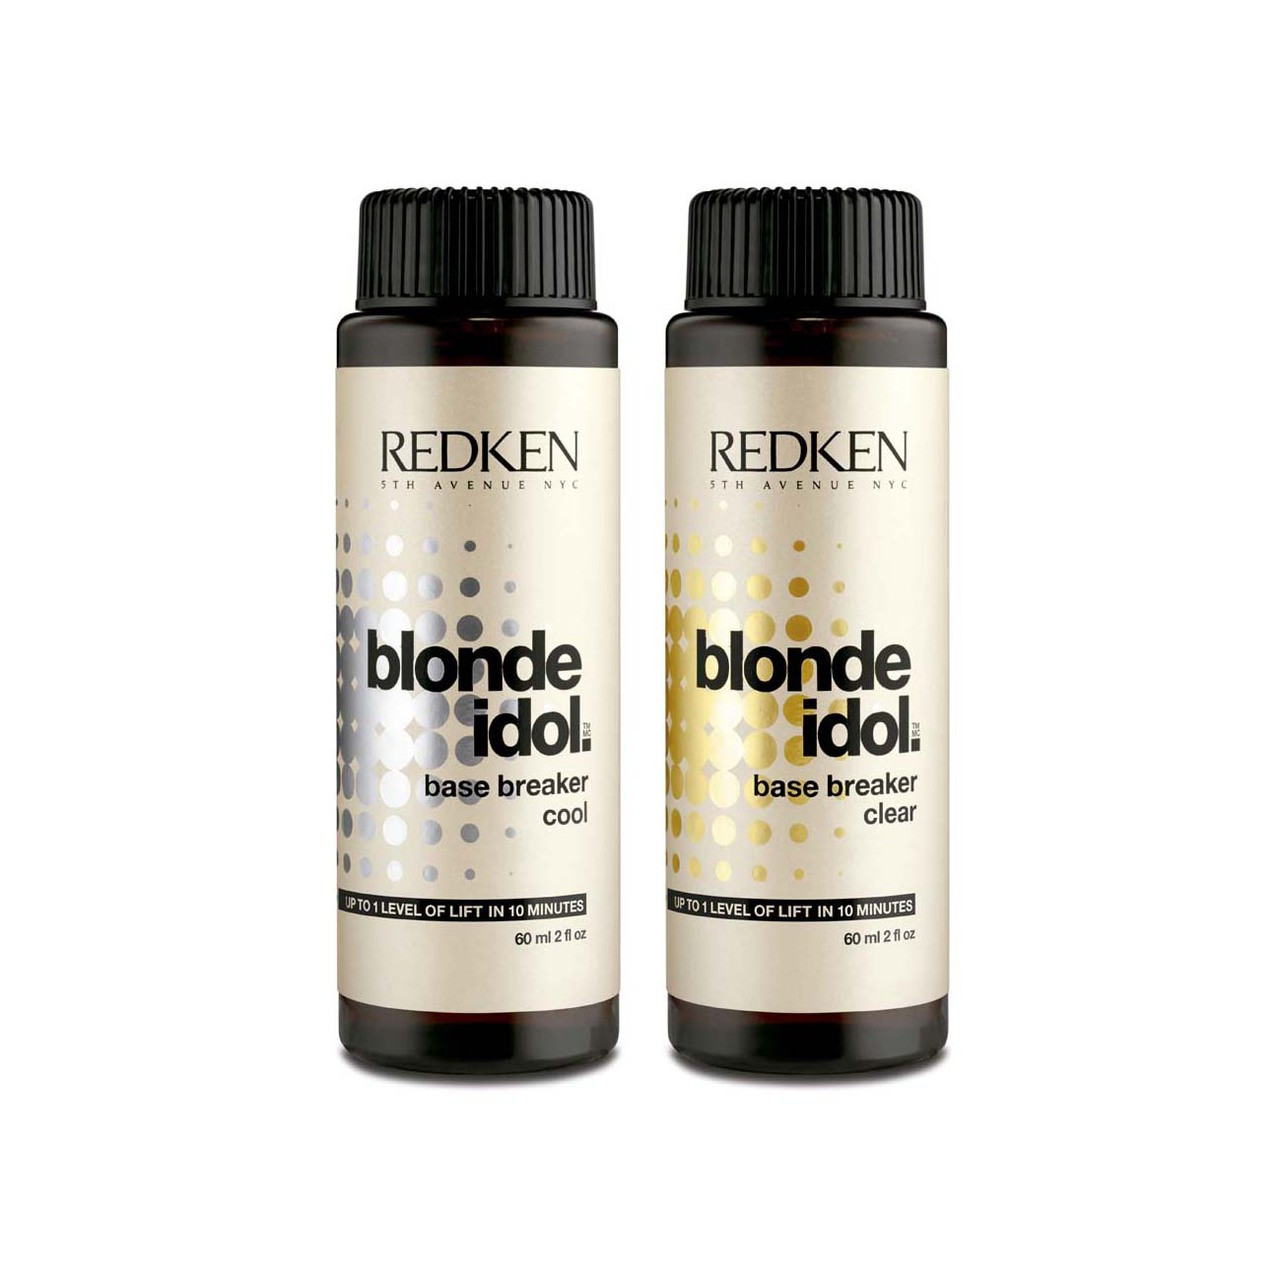 Redken Blonde Idol Base Breaker Sleekshop Com Formerly Sleekhair